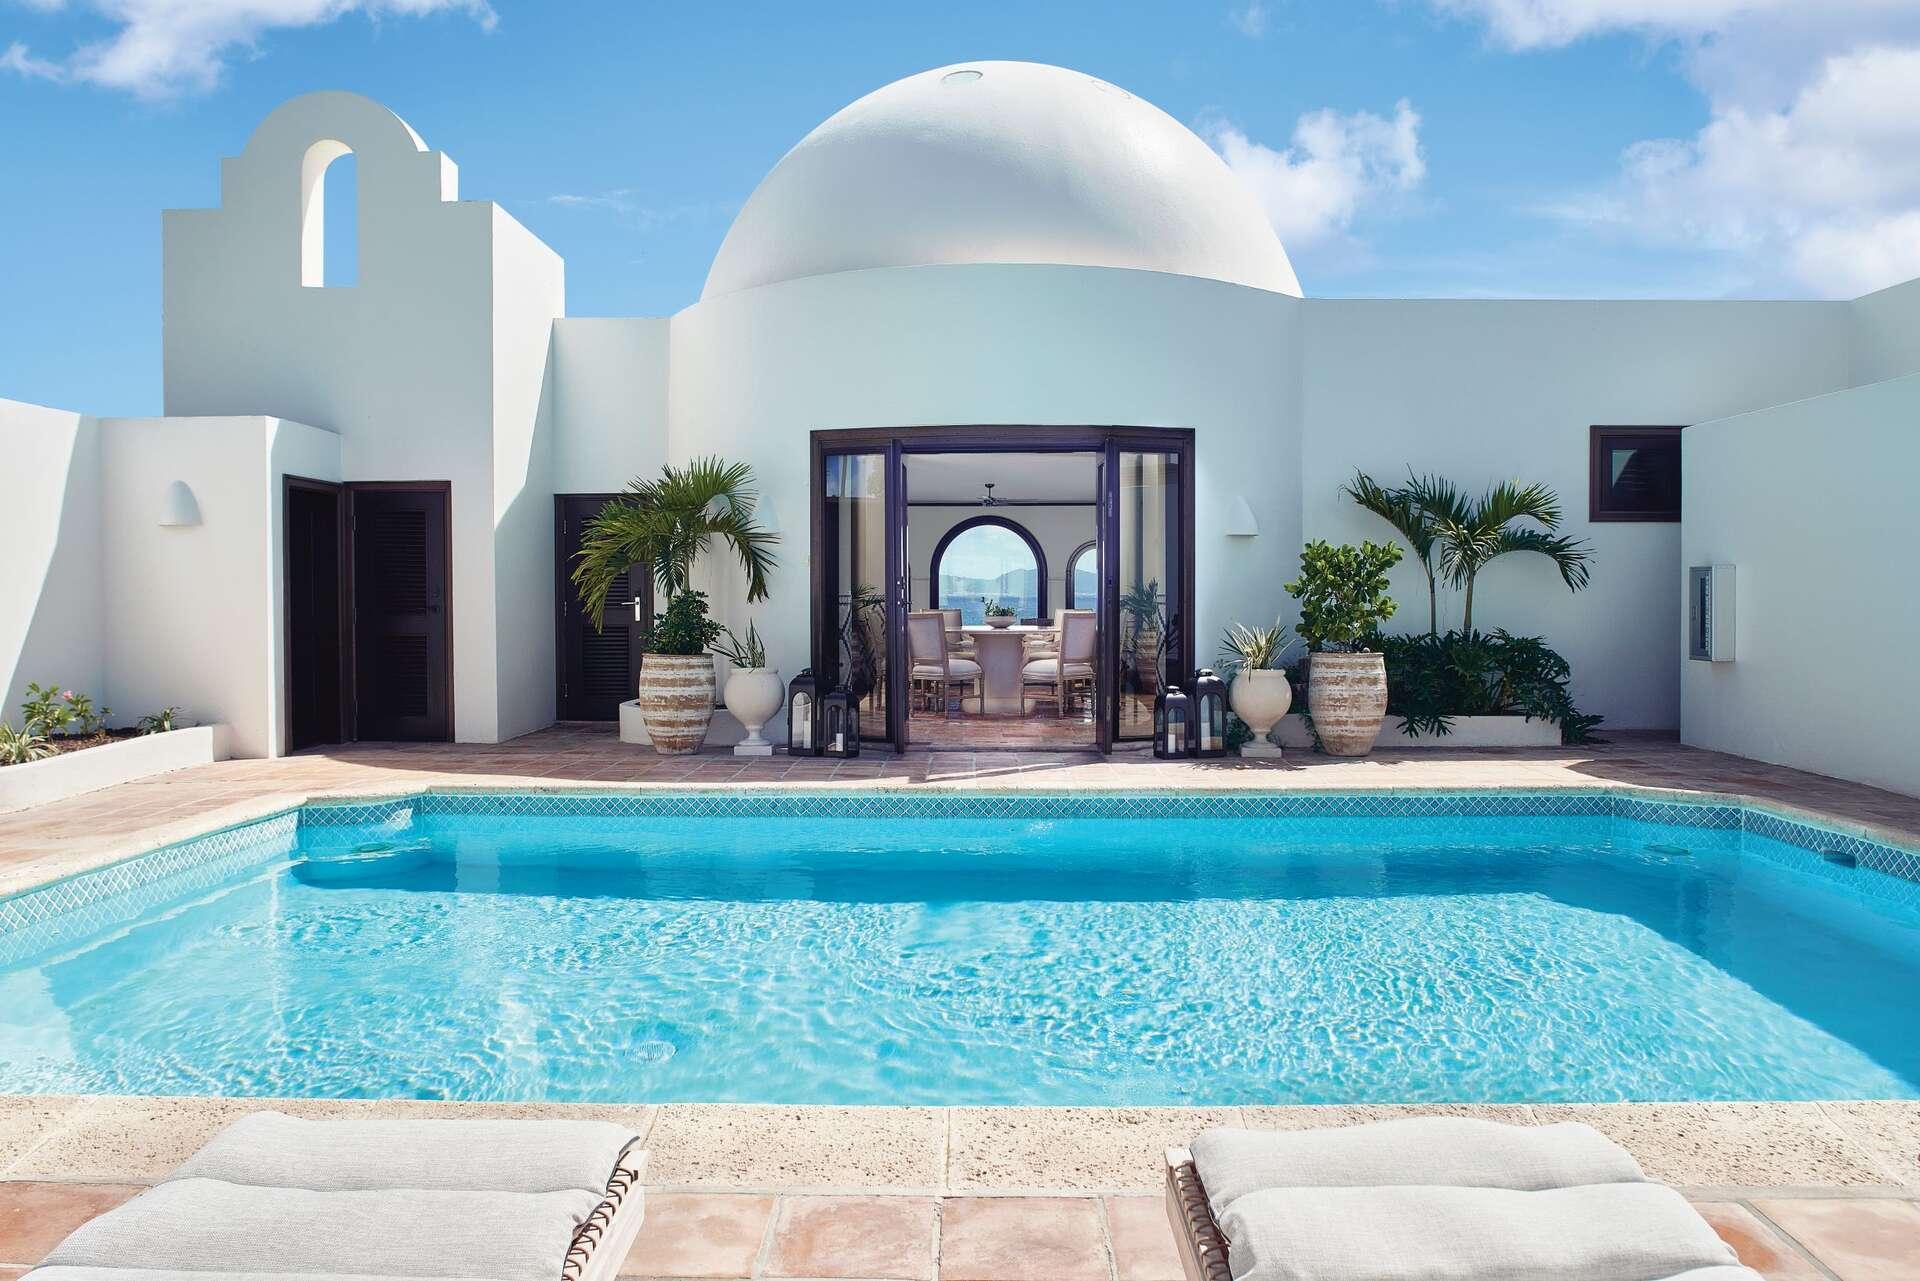 Luxury villa rentals caribbean - Anguilla - Belmond cap juluca - No location 4 - 5 BDM Pool Villa - Image 1/19